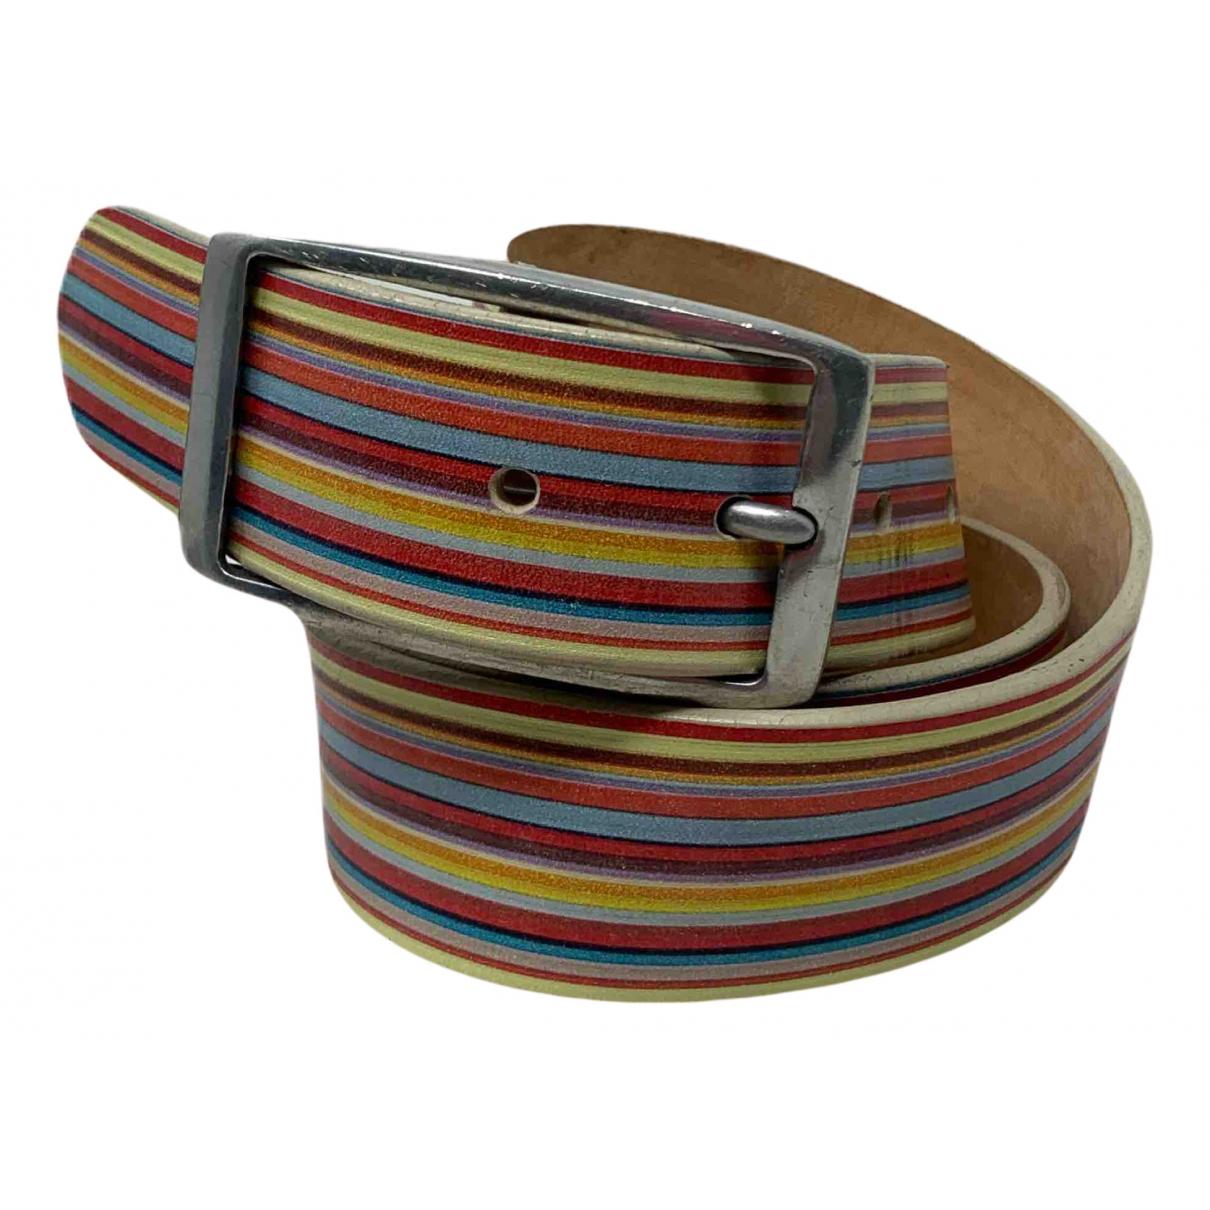 Paul Smith N Multicolour Leather belt for Women 85 cm